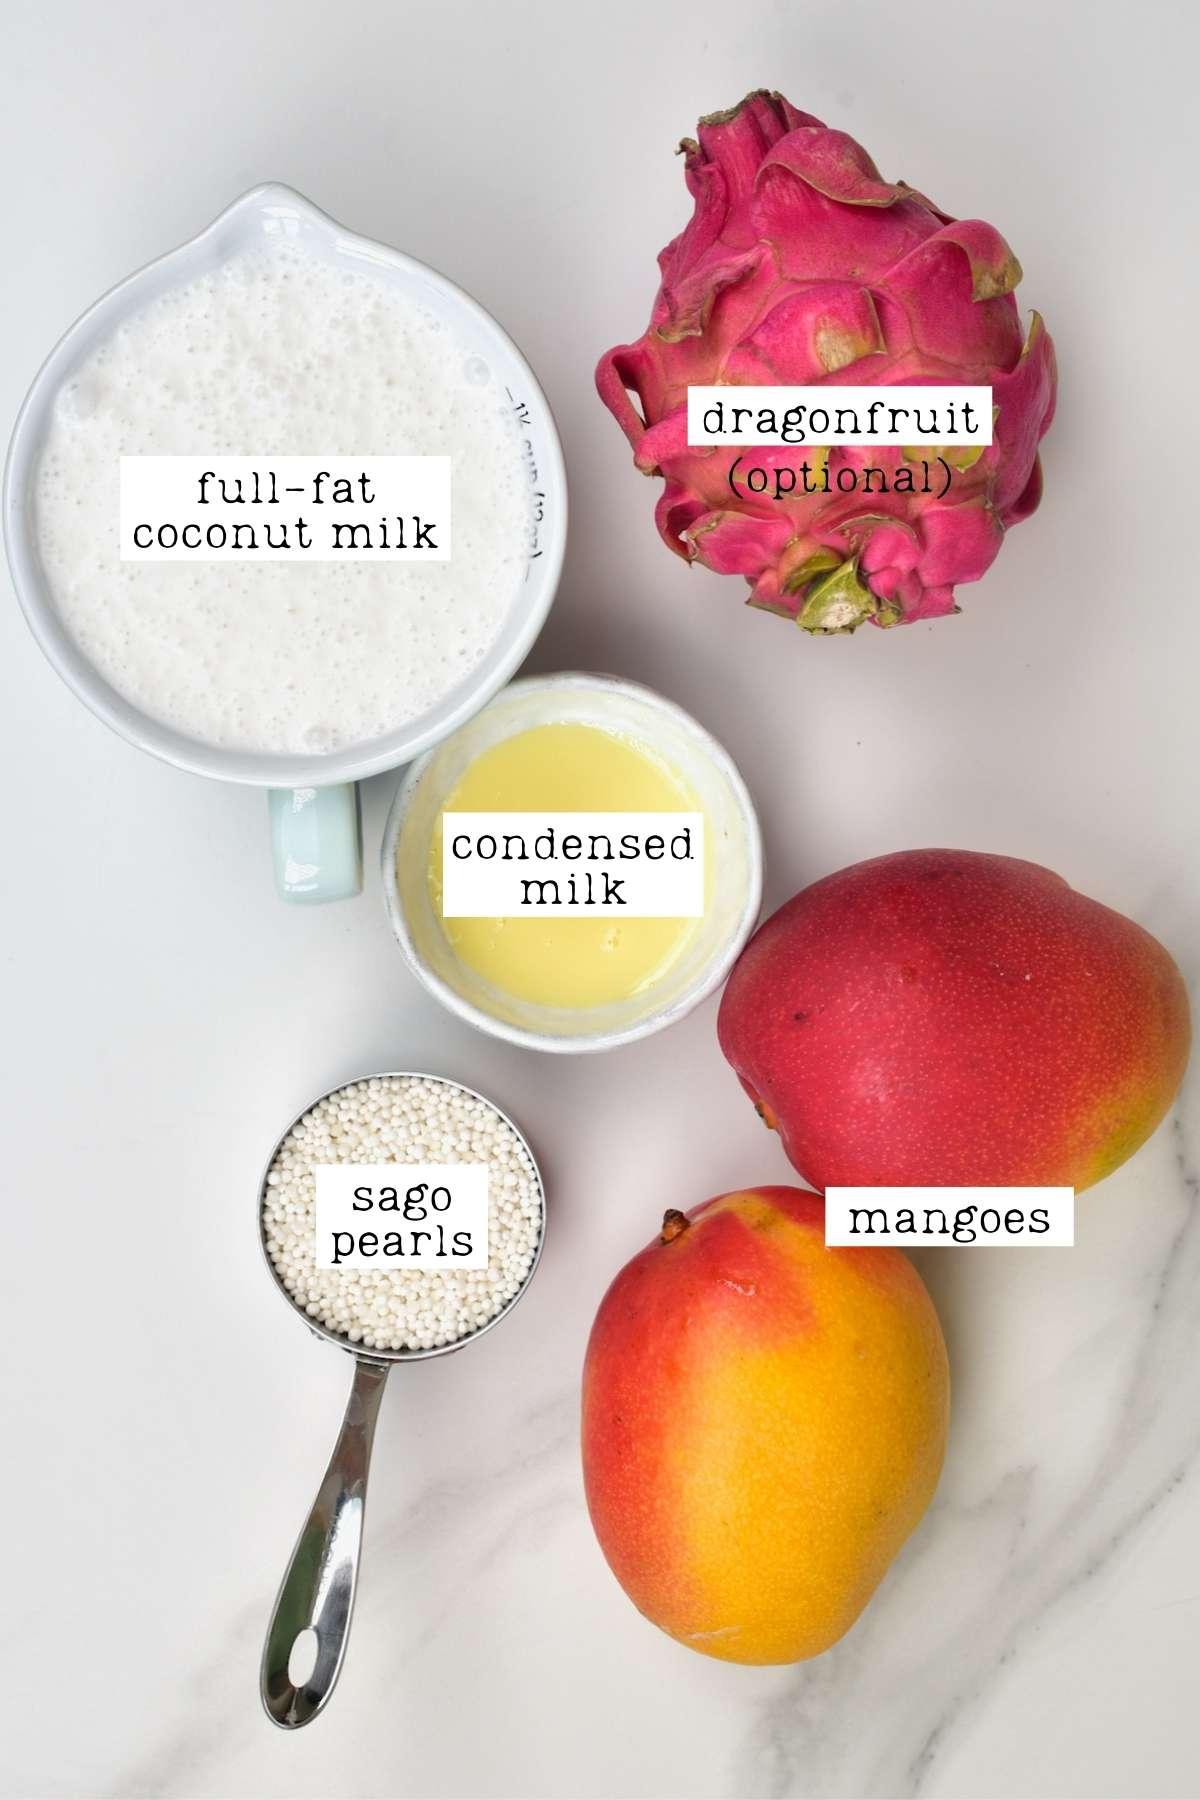 Ingredients for Mango Sago